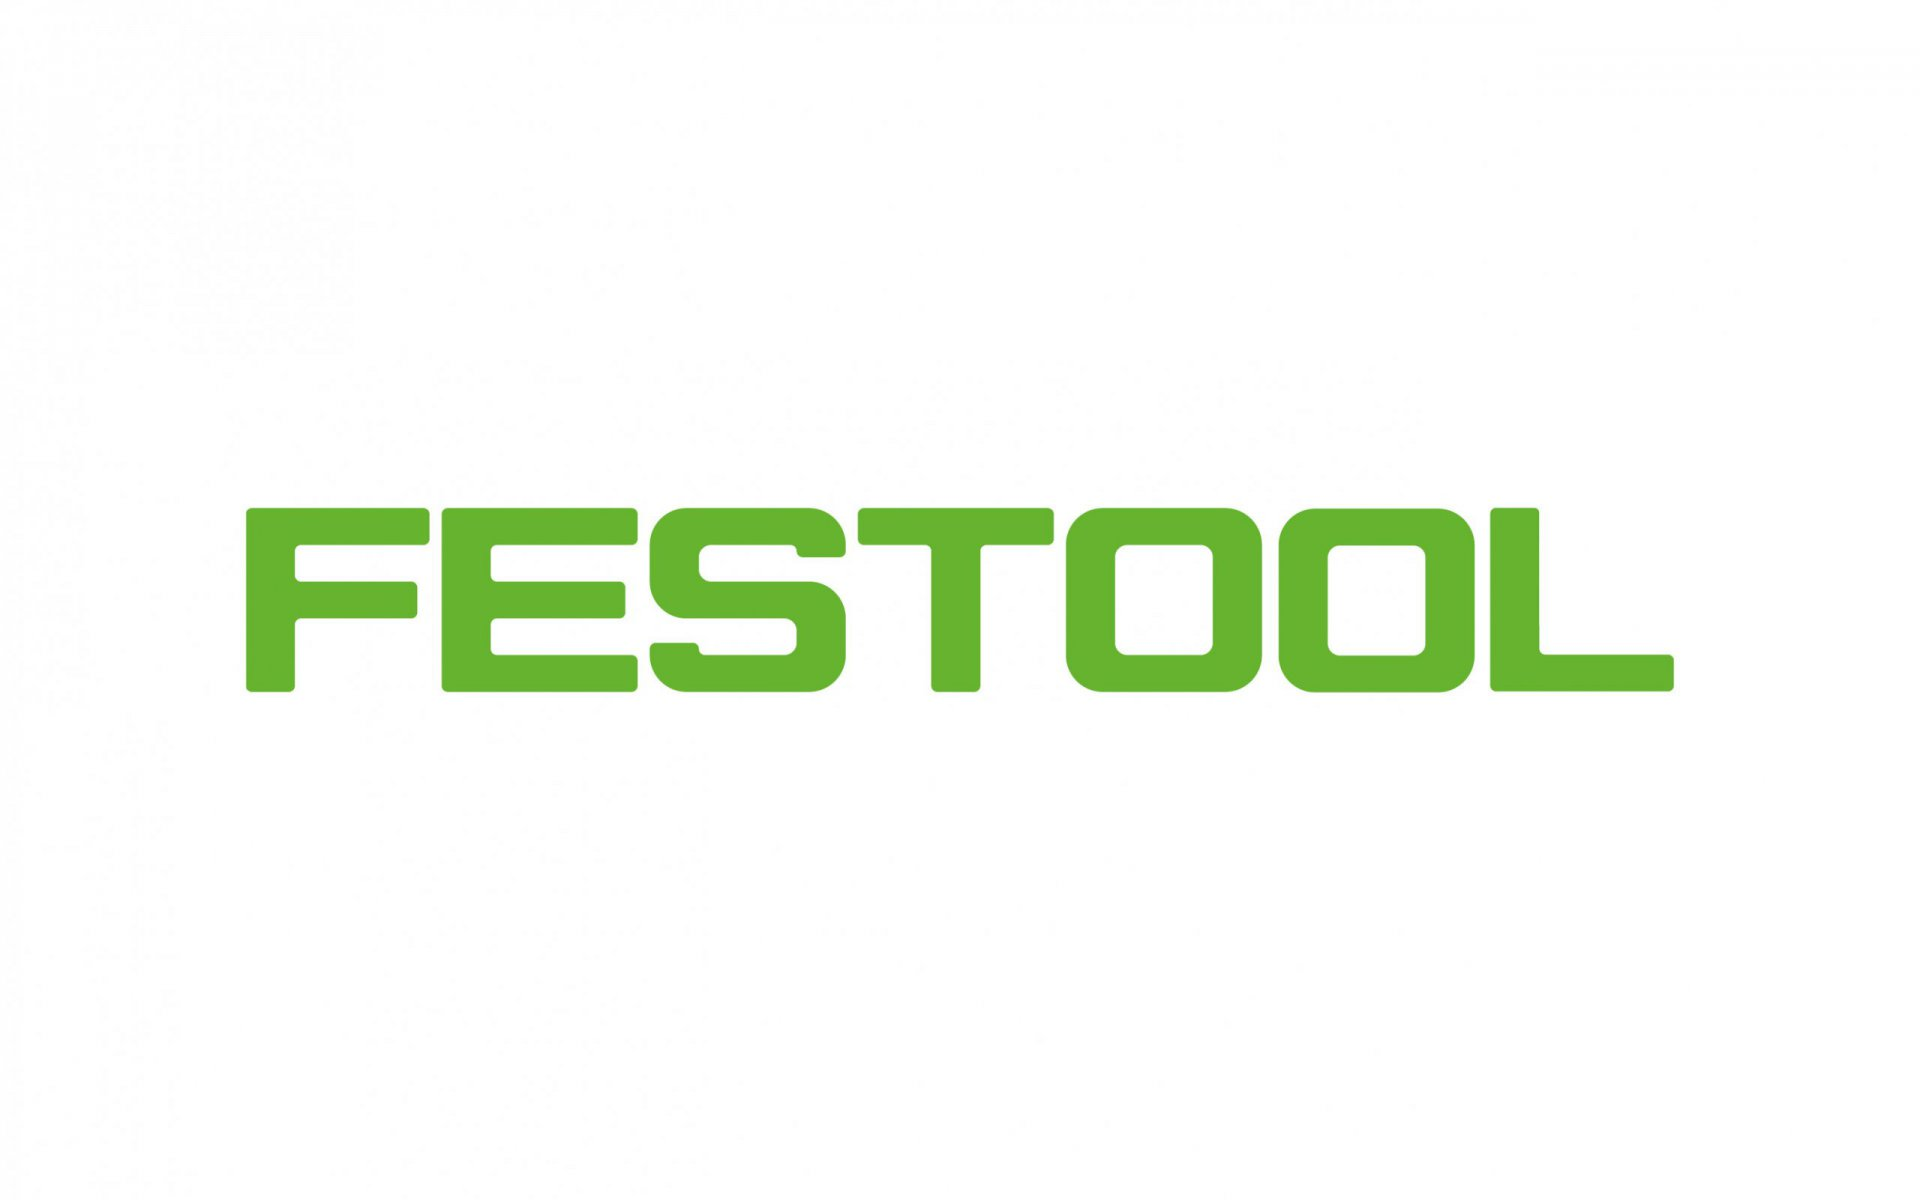 Festool-logotyp